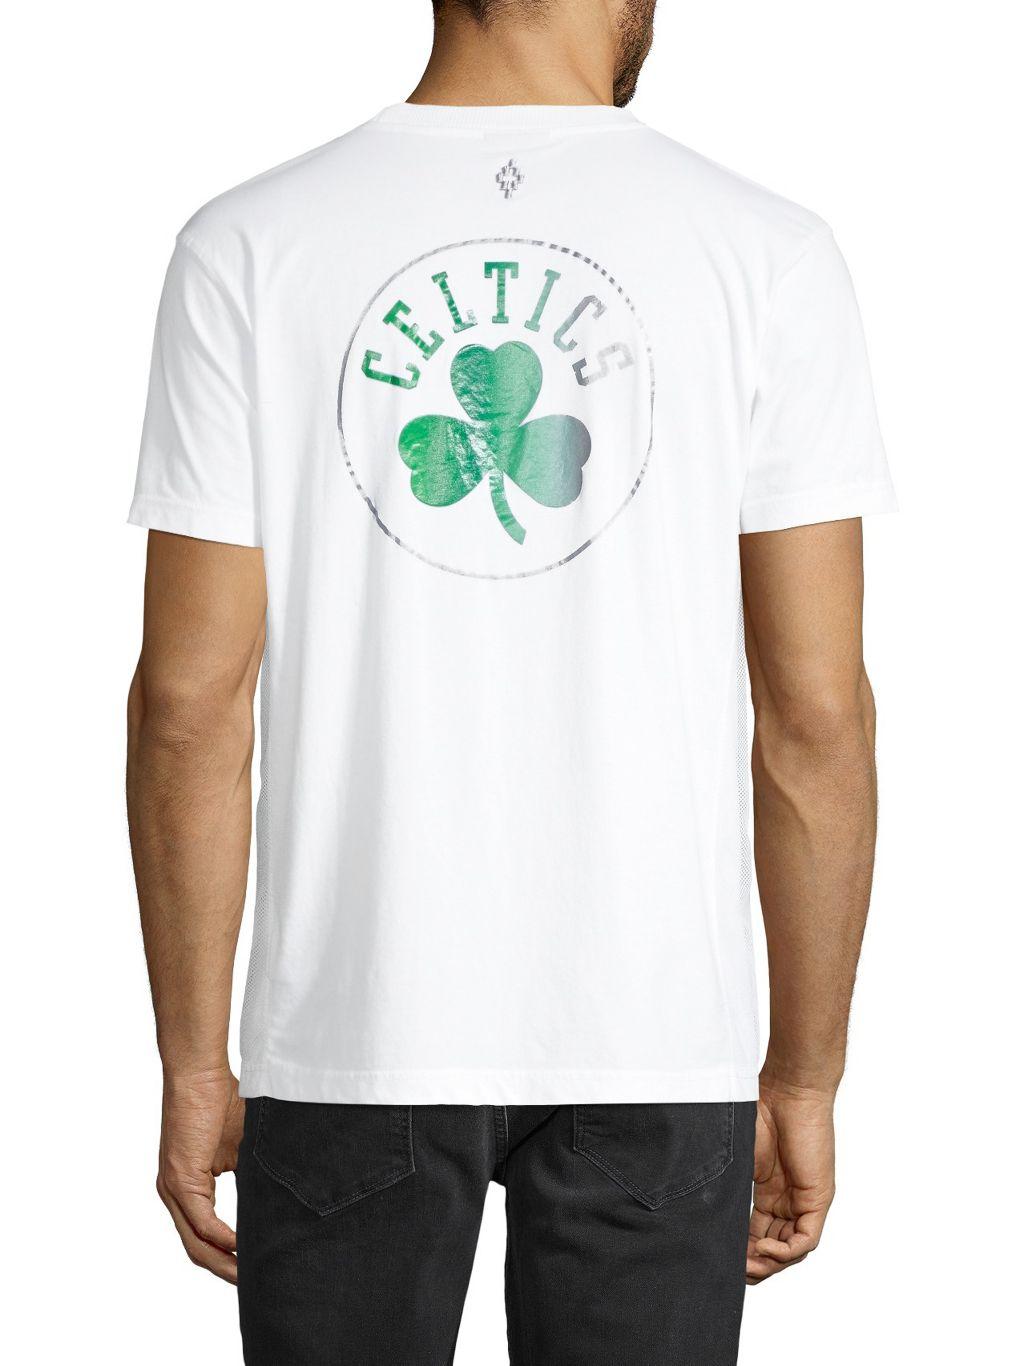 Marcelo Burlon NBA Boston Celtics Crewneck Cotton-Blend Tee